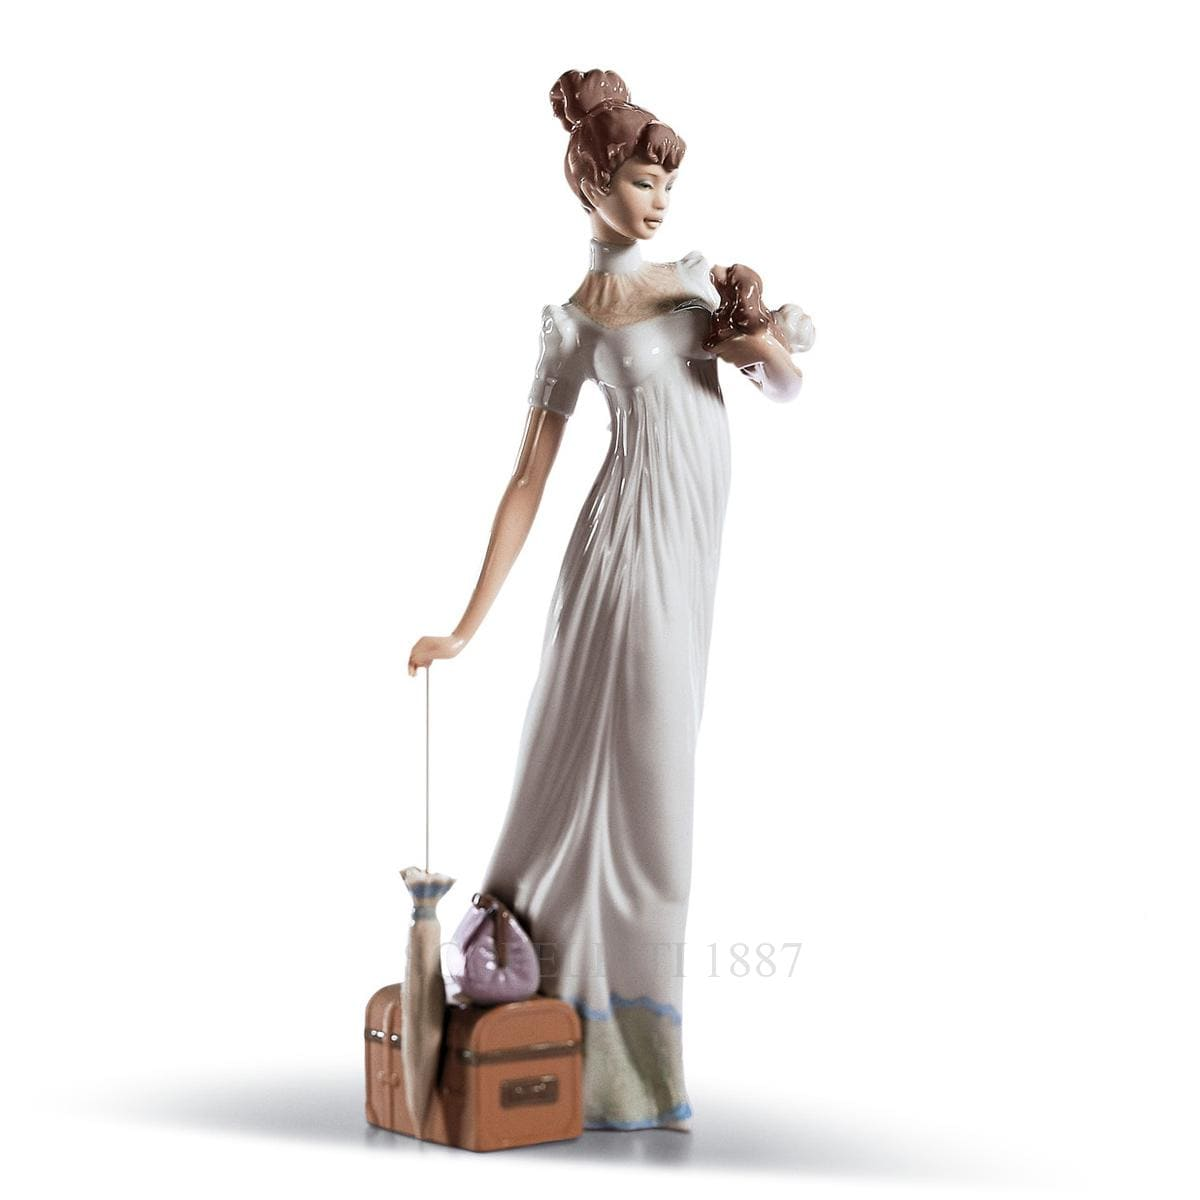 lladro travelling companions porcelain figurine spanish designer